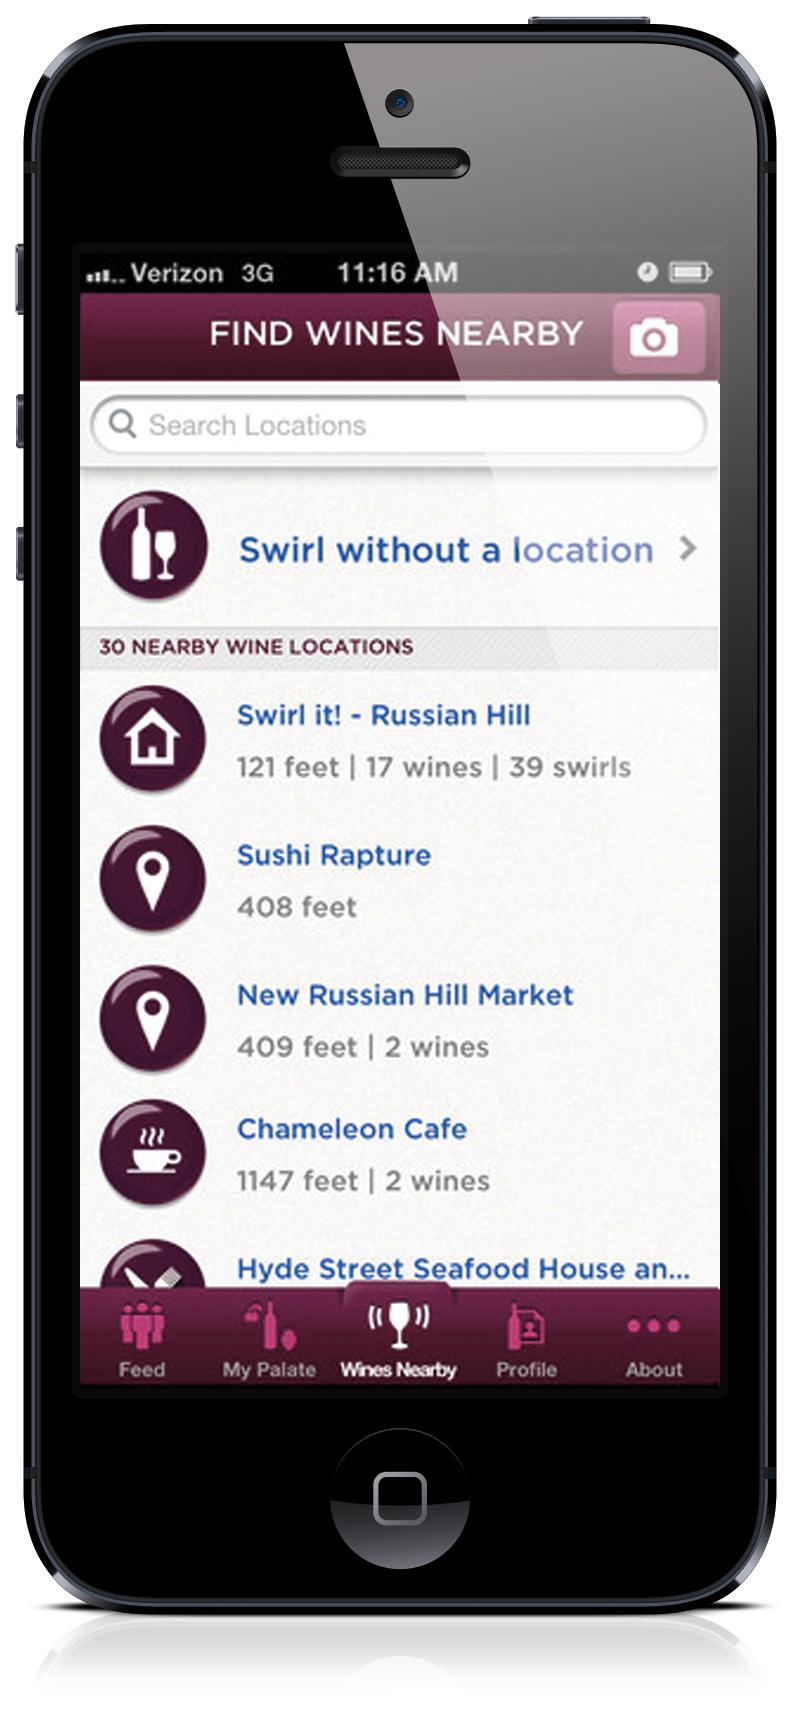 Swirl it! Taste-Based wine Recommendation App - image 1 - student project